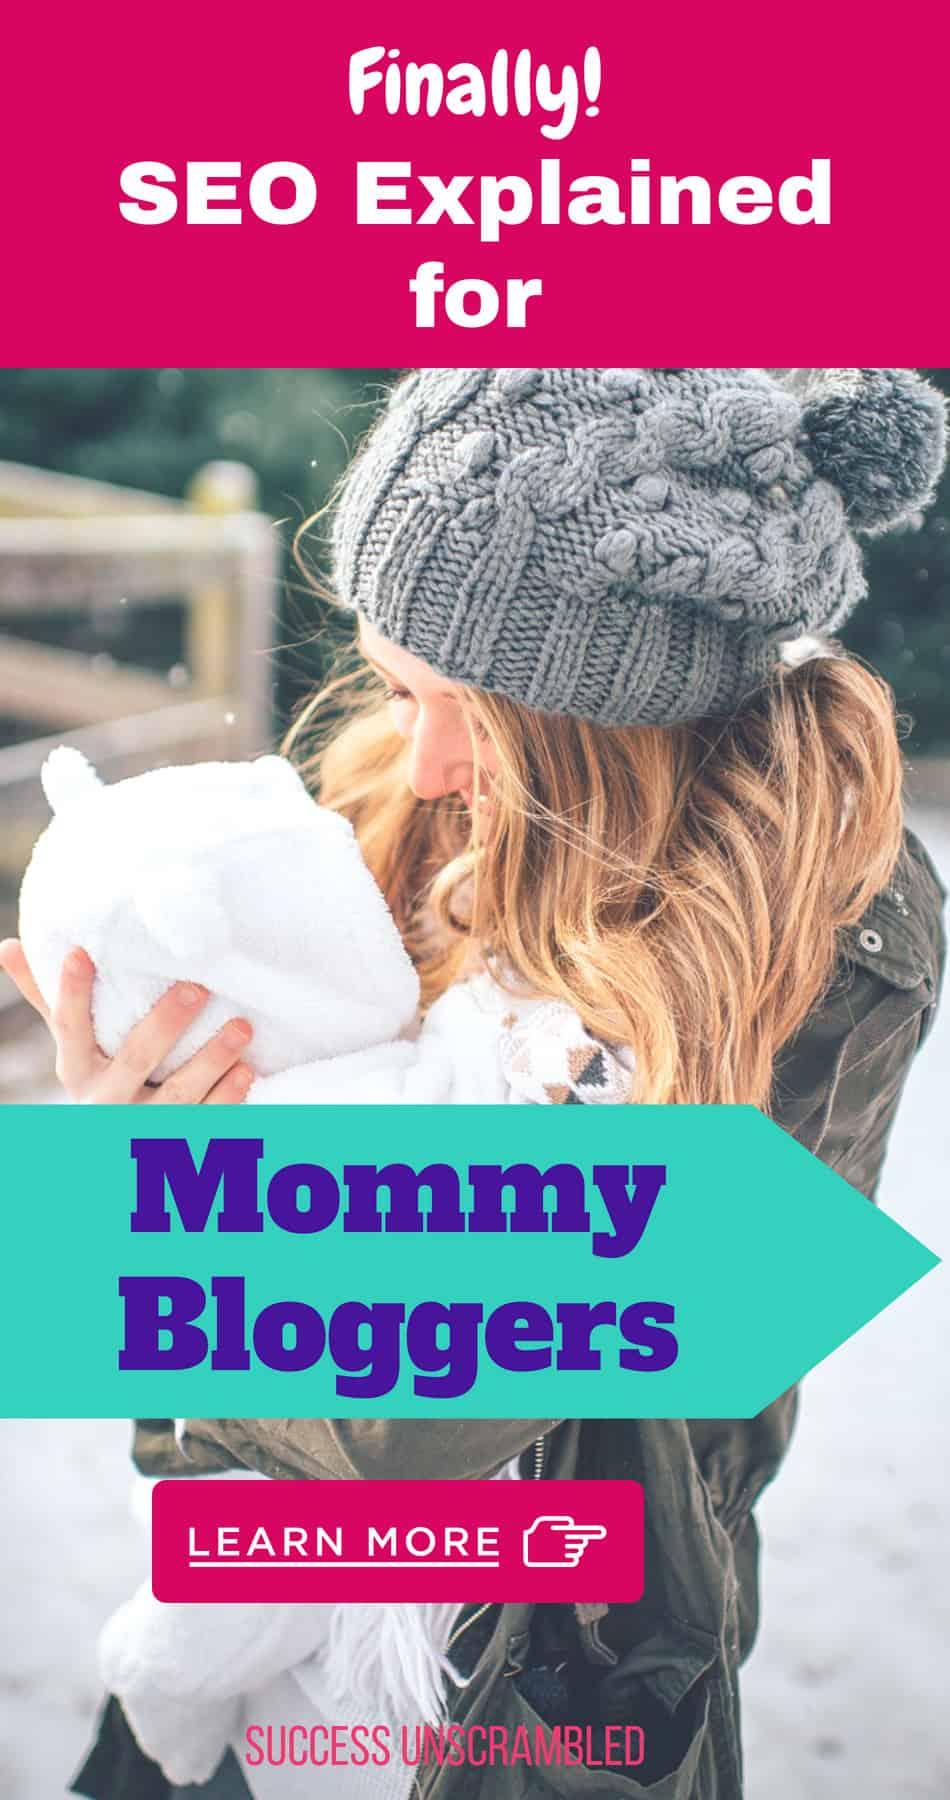 https://www.successunscrambled.com/mummy-bloggers/